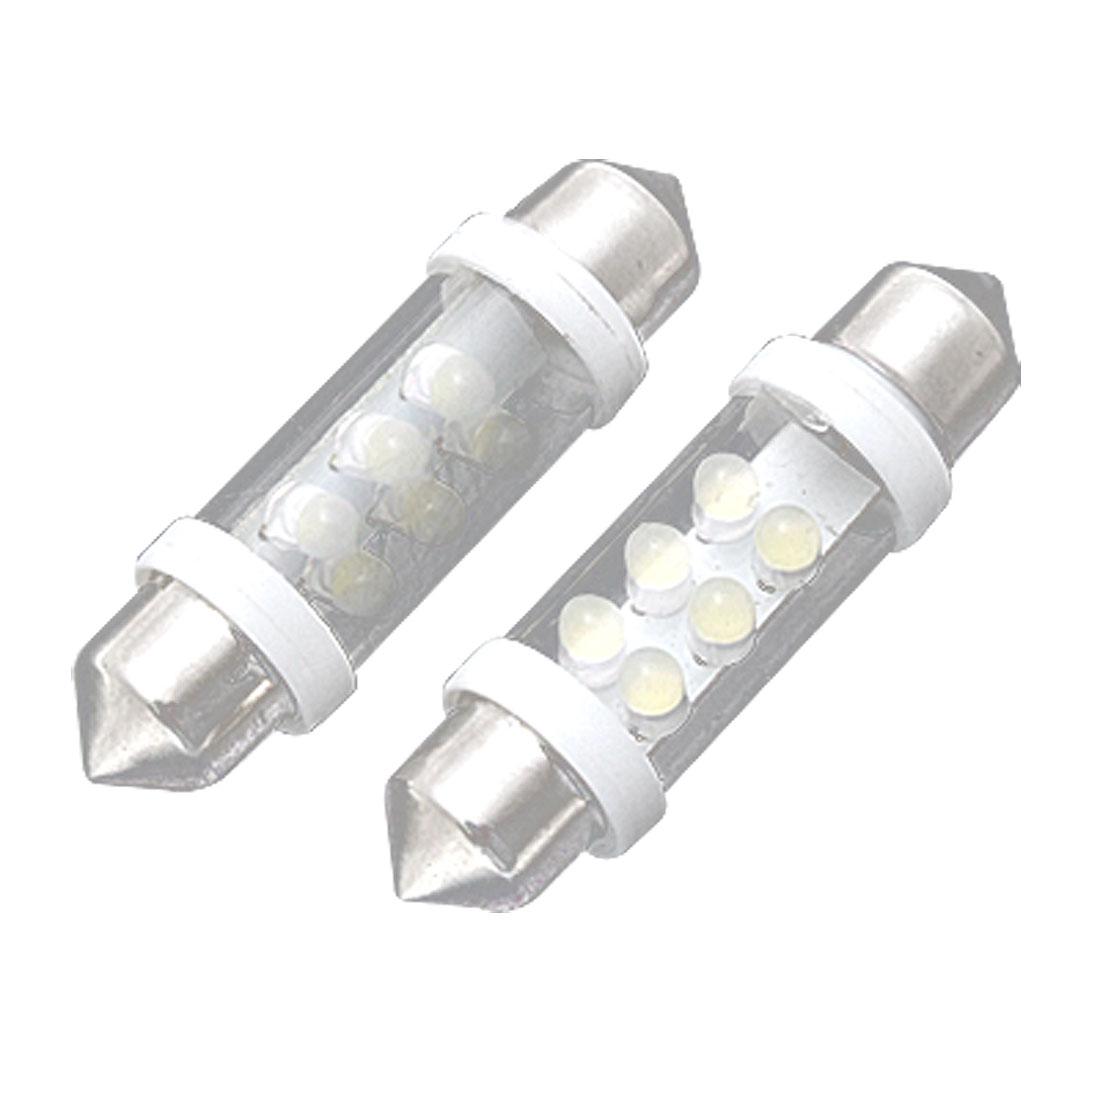 2 Pcs Car White 6 LED Festoon Dome Map Light License Plate Bulbs 41mm